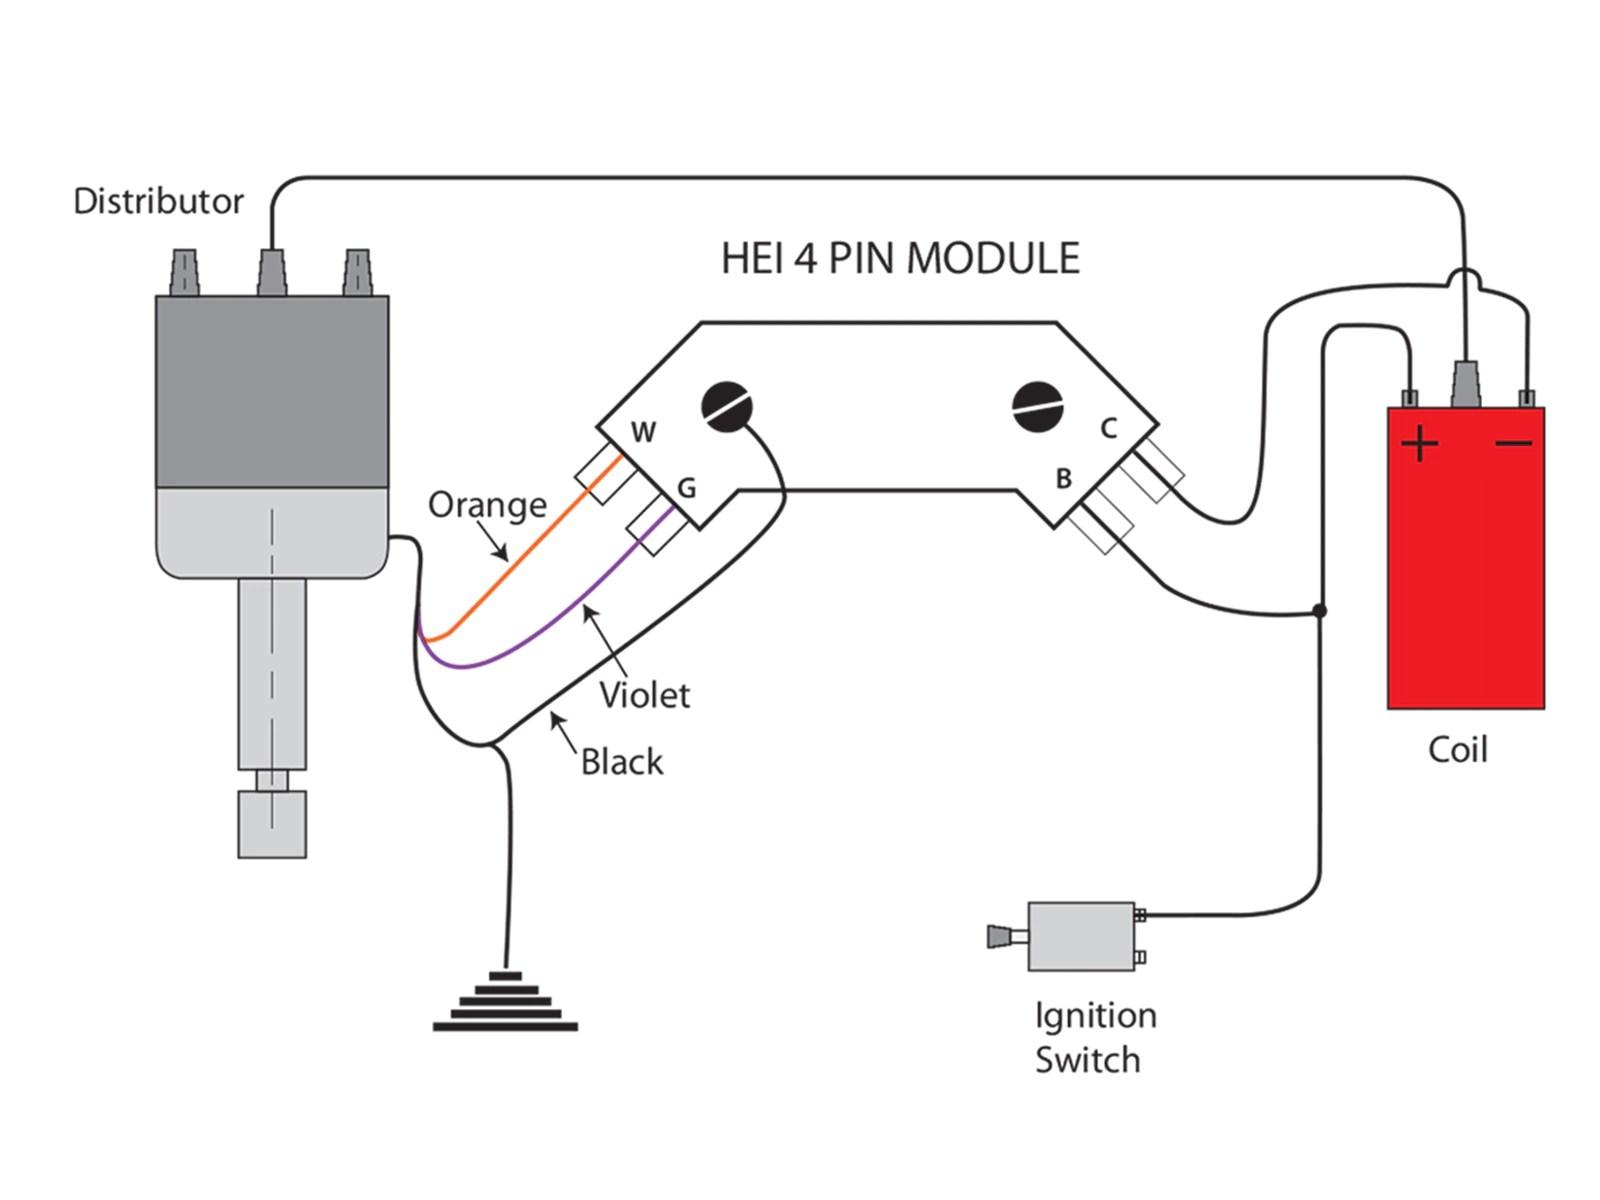 Gm Hei 4 Pin Ignition Module Wiring Diagram - Wiring Diagram Write Gm Control Module Wiring Diagram on gm coil wiring, gm distributor wiring, gm throttle position sensor wiring, gm steering wheel wiring,